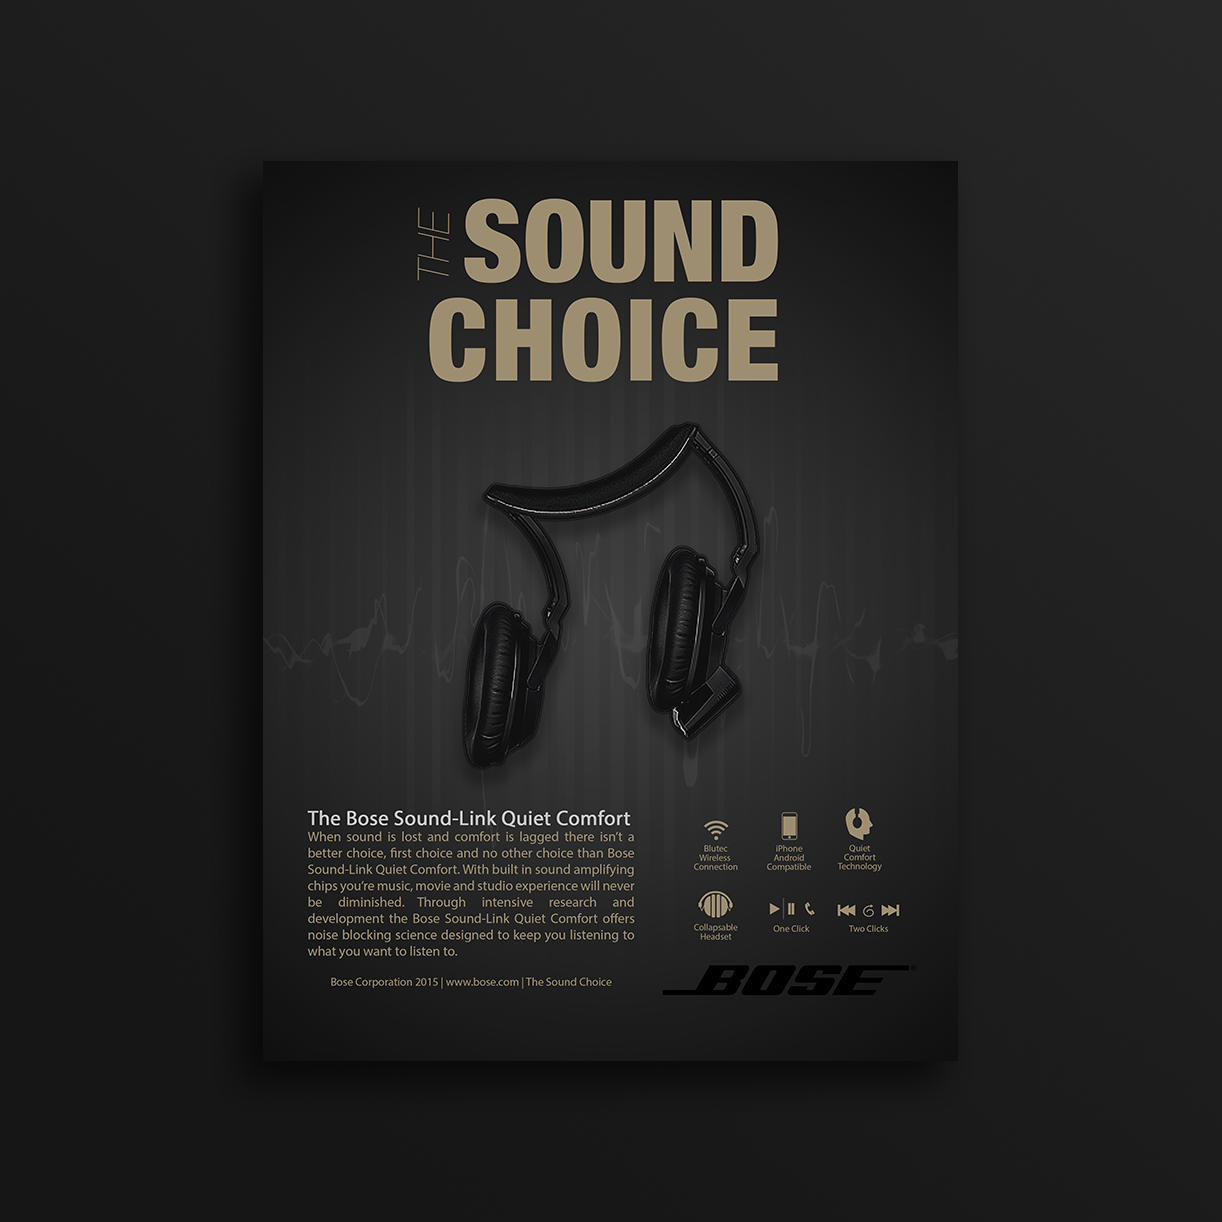 boseheadphonemusicad3 copy.png